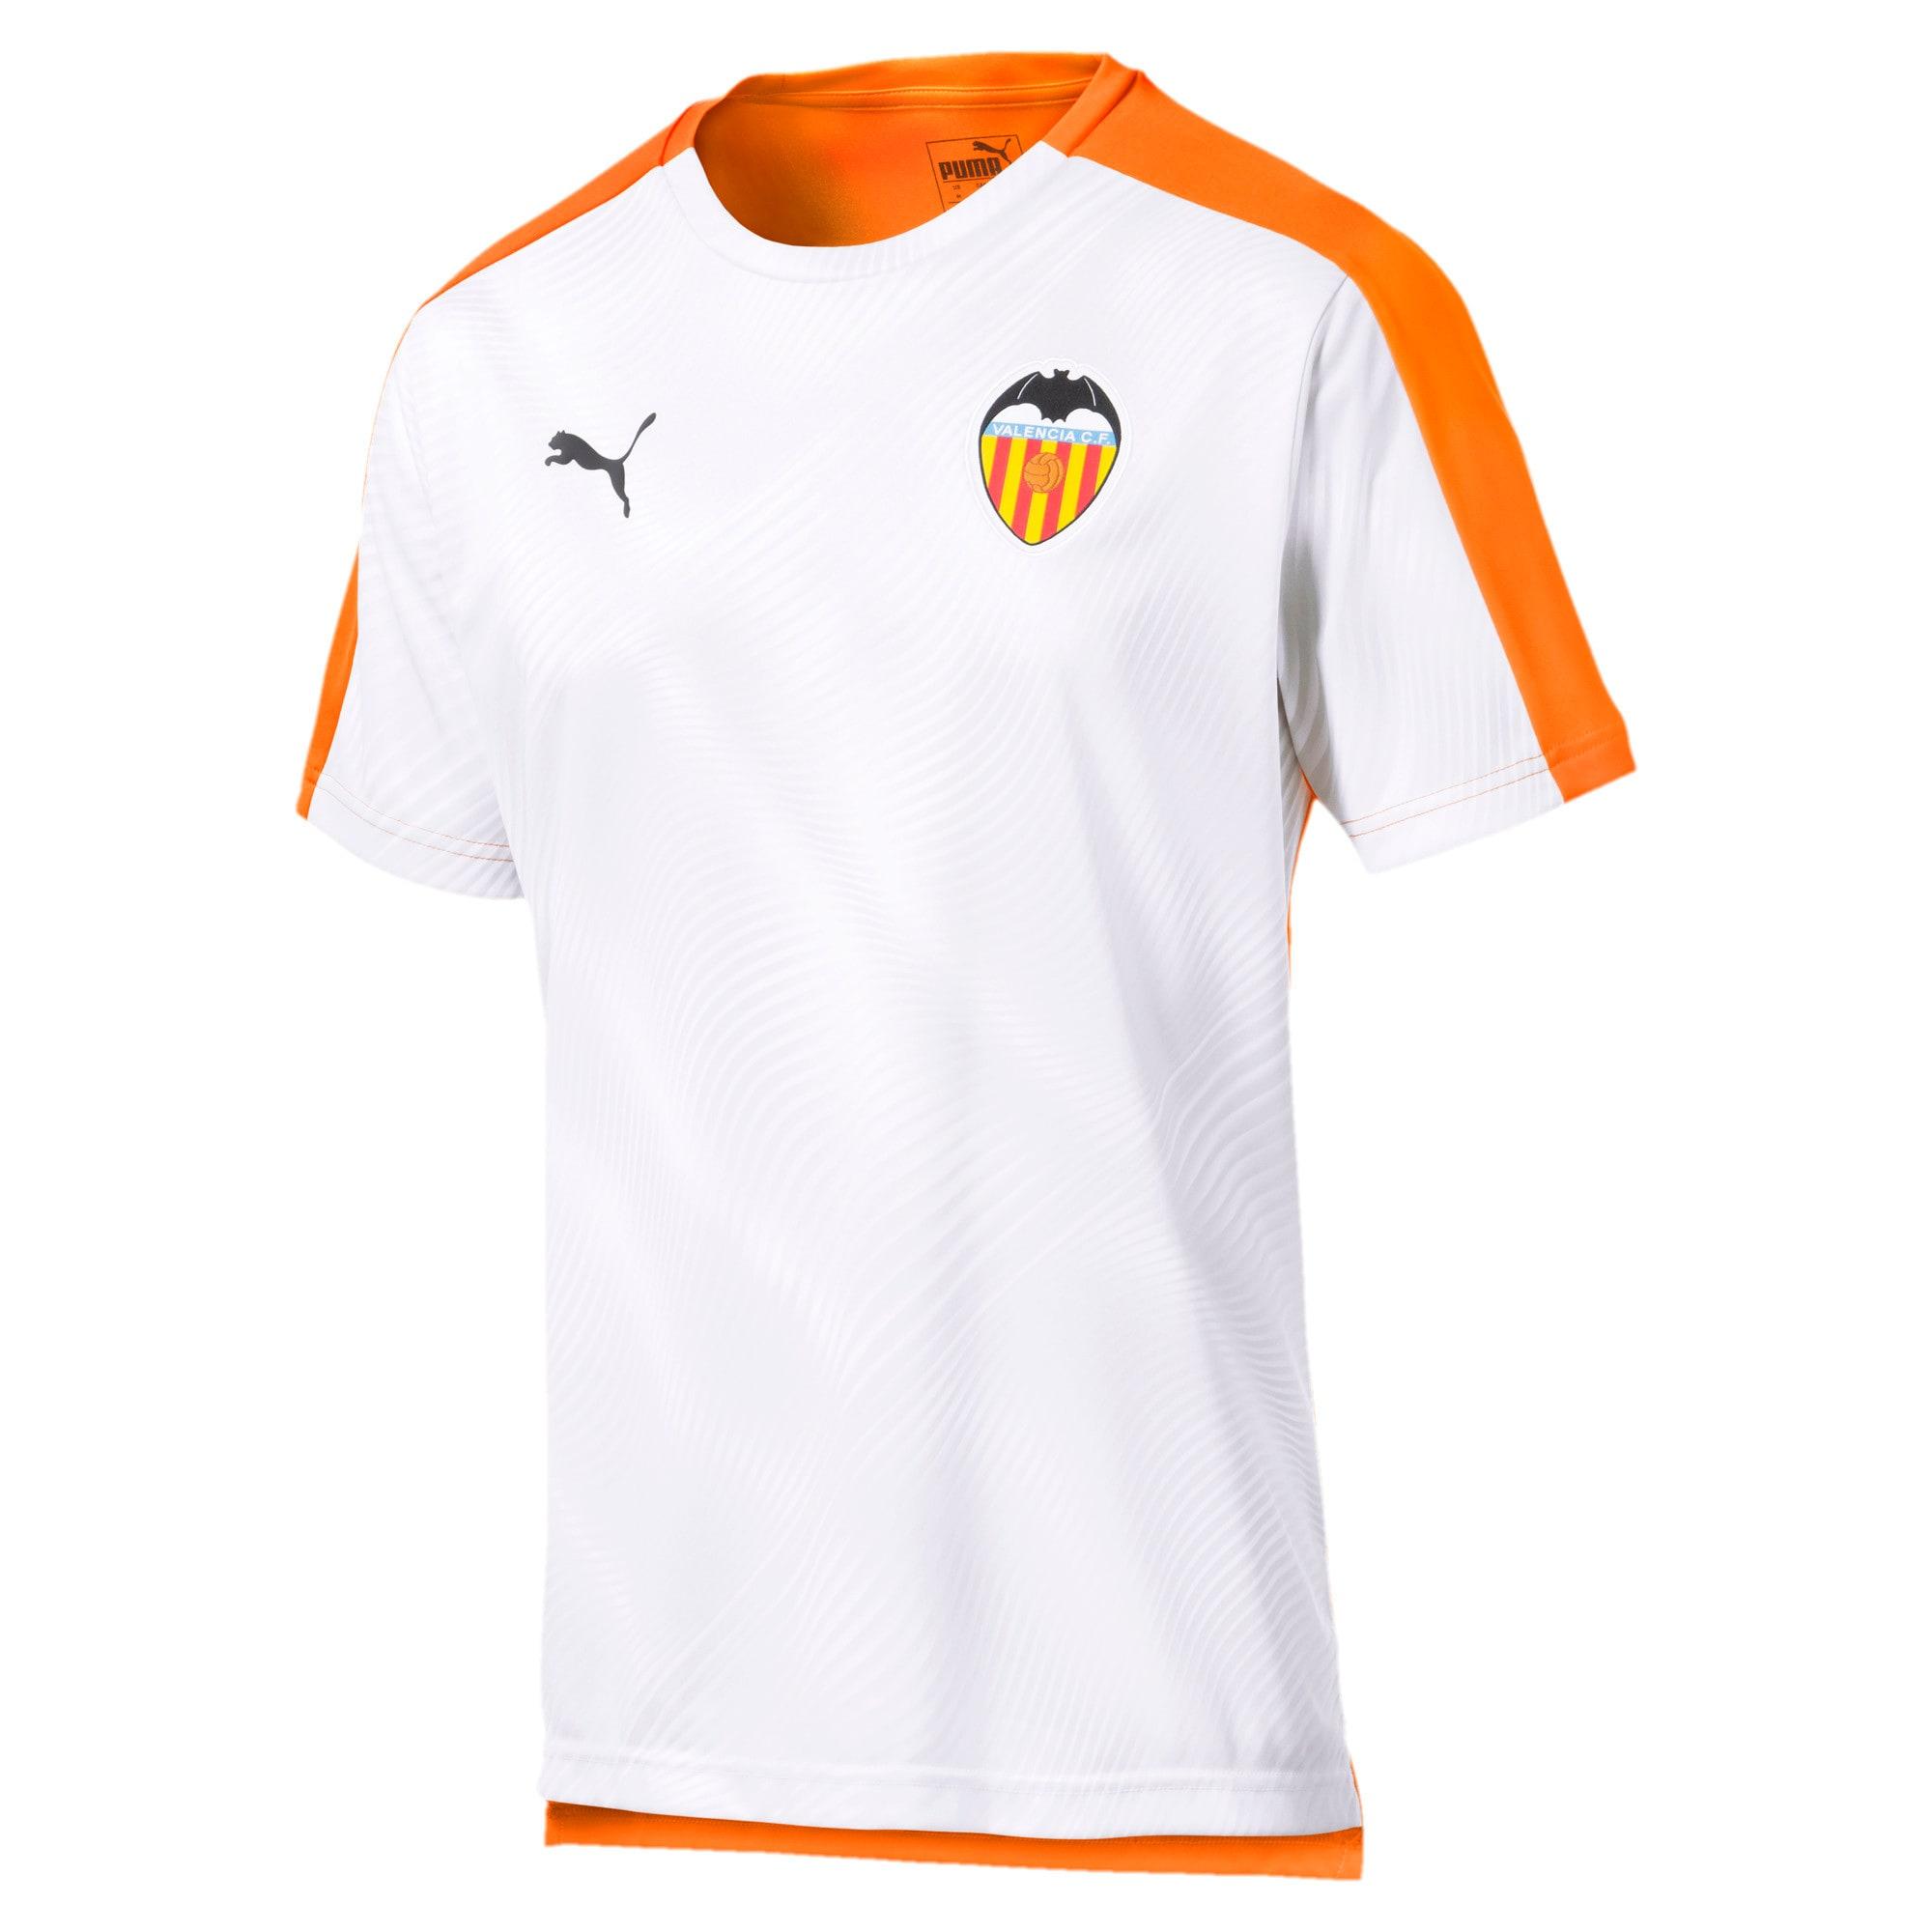 Thumbnail 1 of Valencia CF Men's Stadium Jersey, Vibrant Orange-Puma White, medium